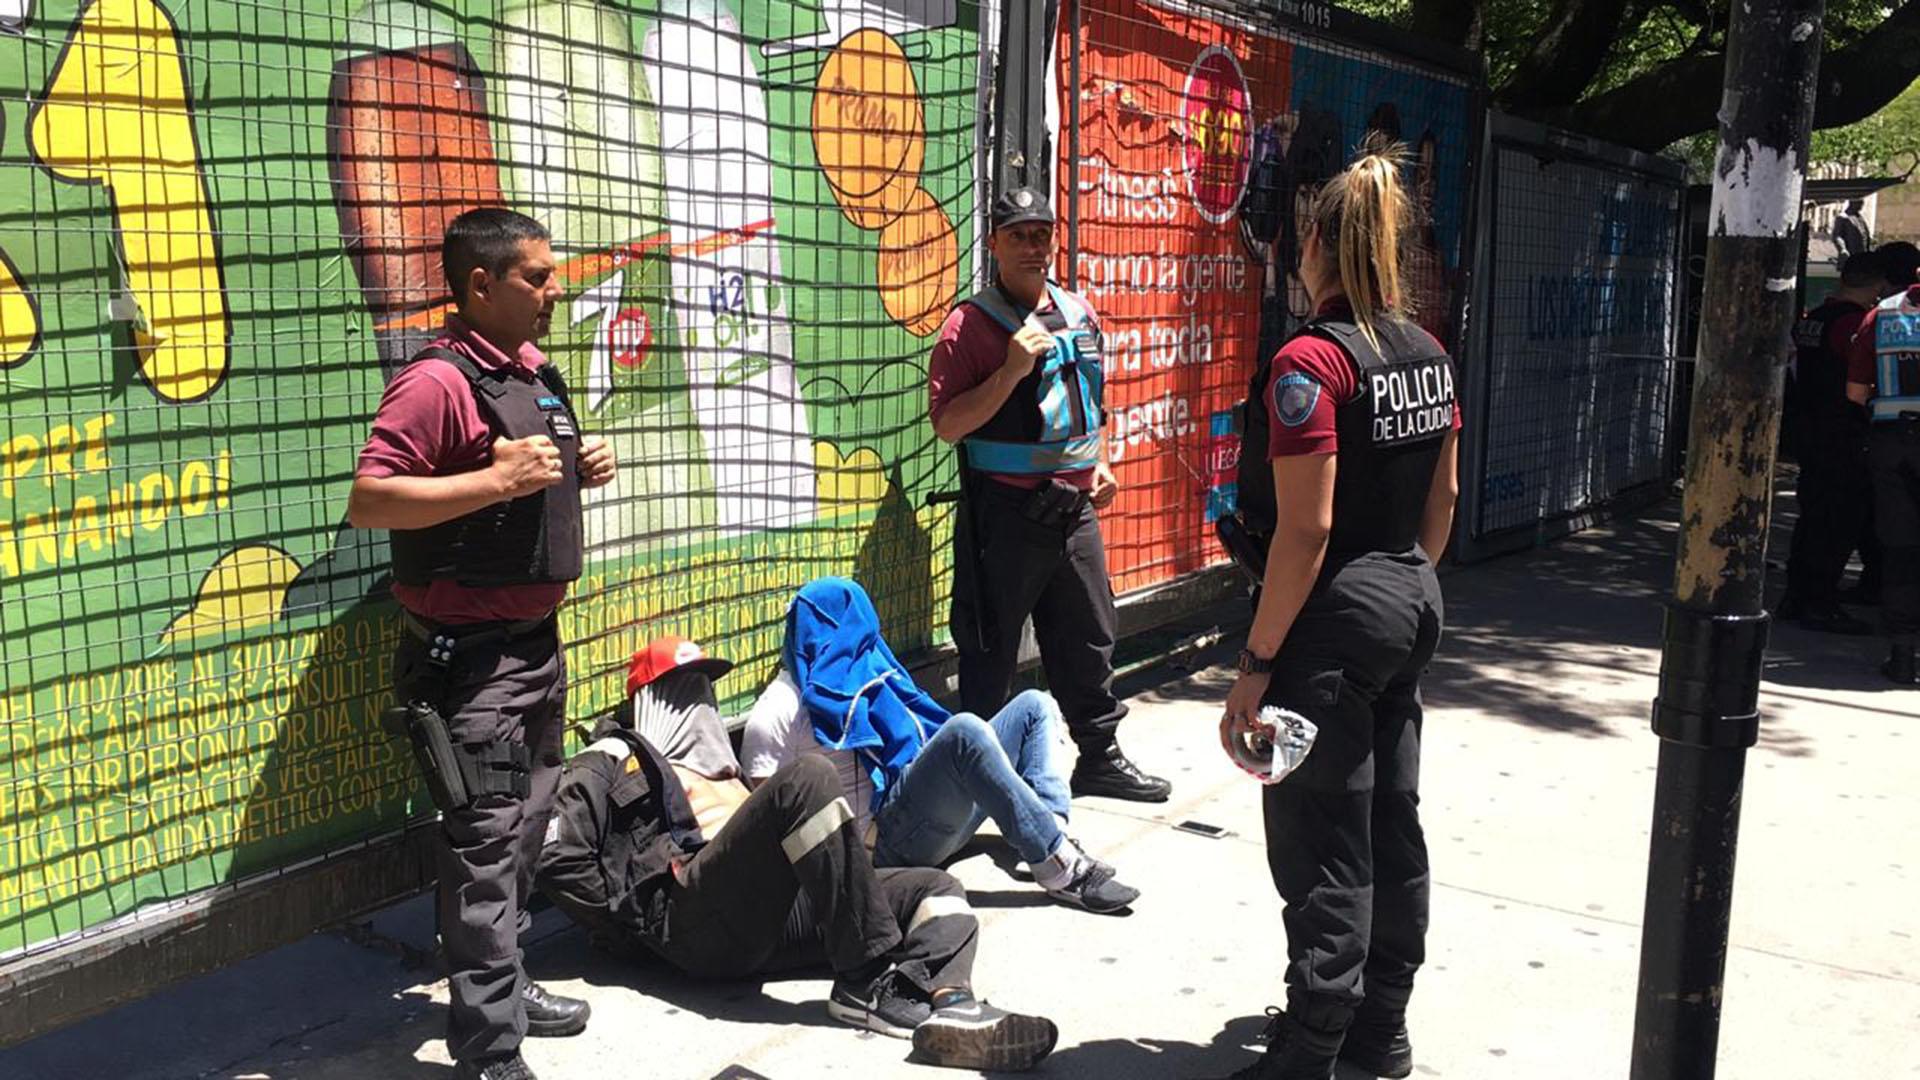 Los dos sospechosos detenidos esta tarde en la avenida Córdoba